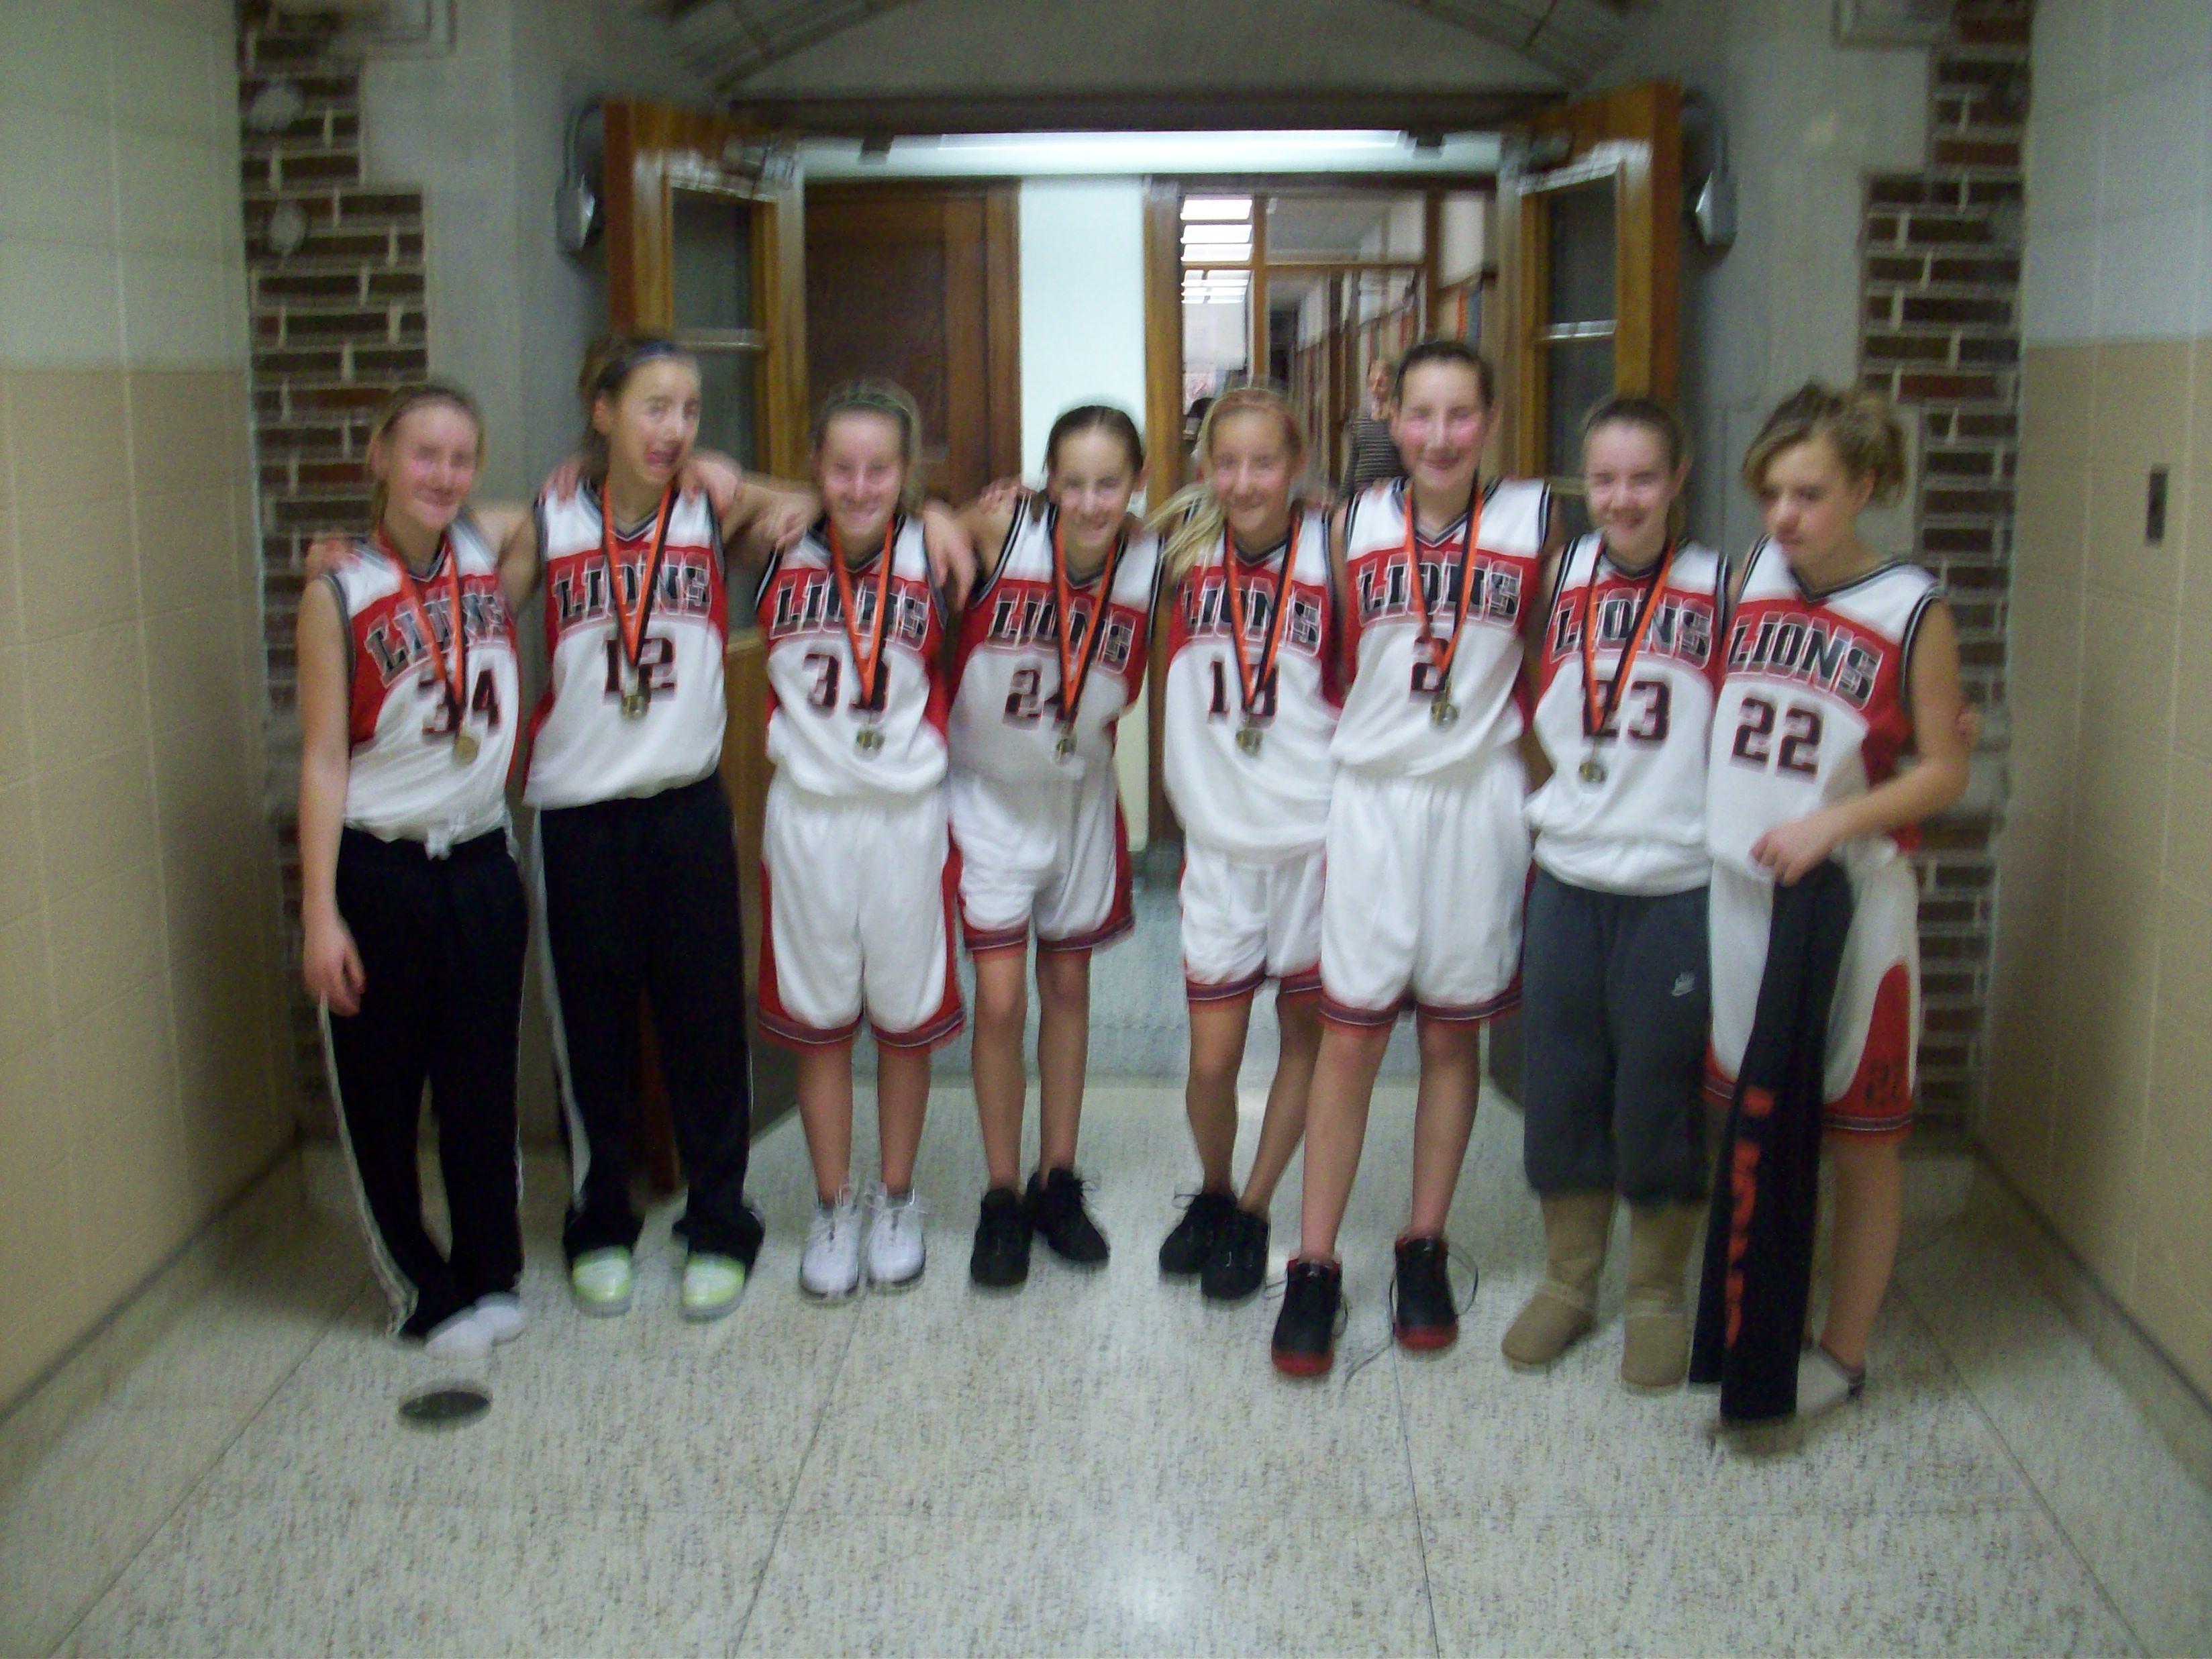 Iowa Valley Champions 2009